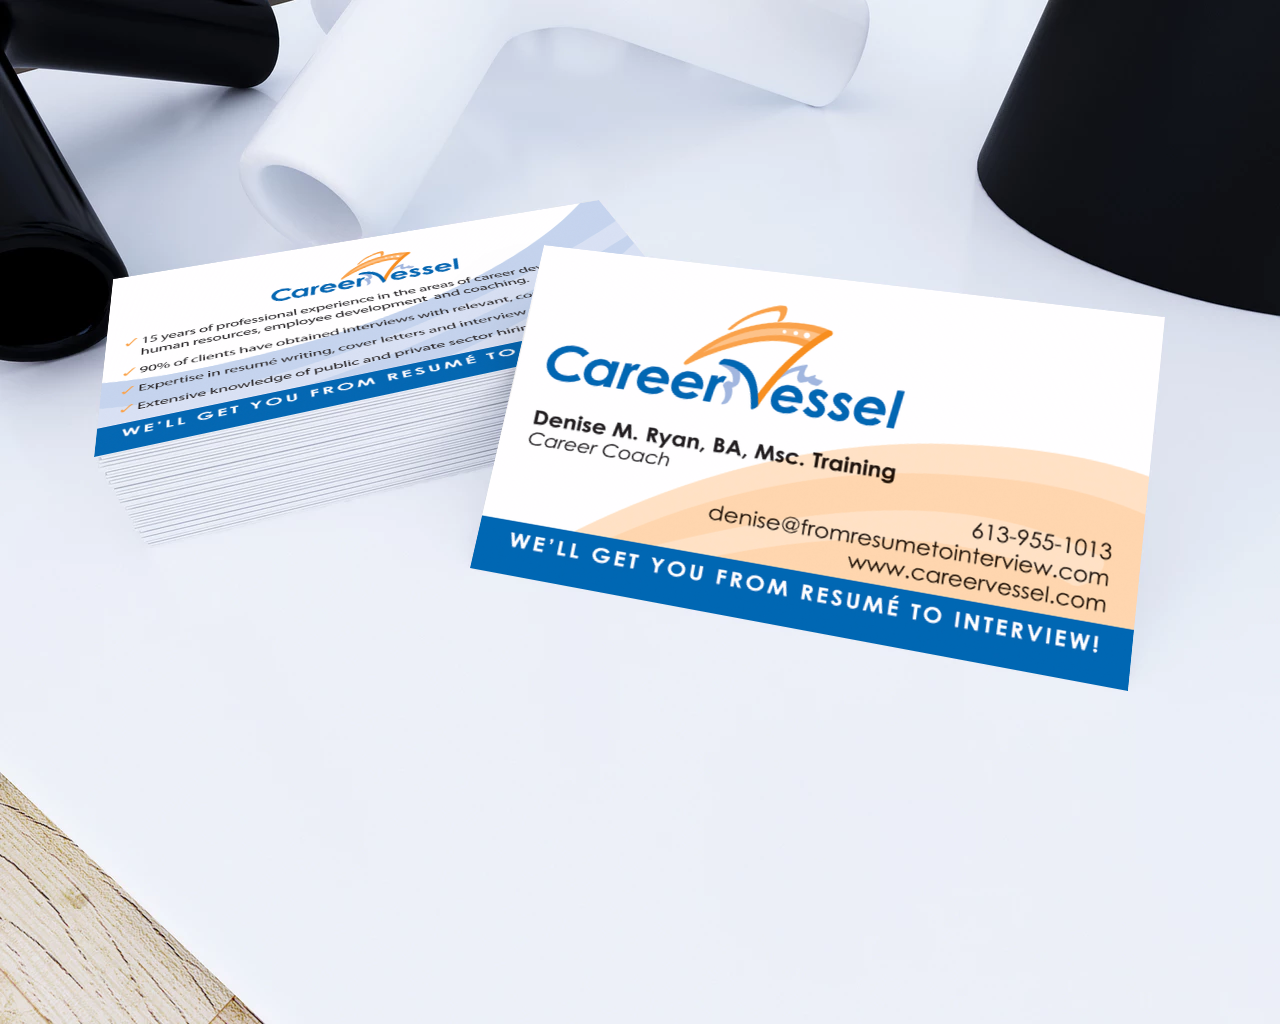 Career Vessel Business Card